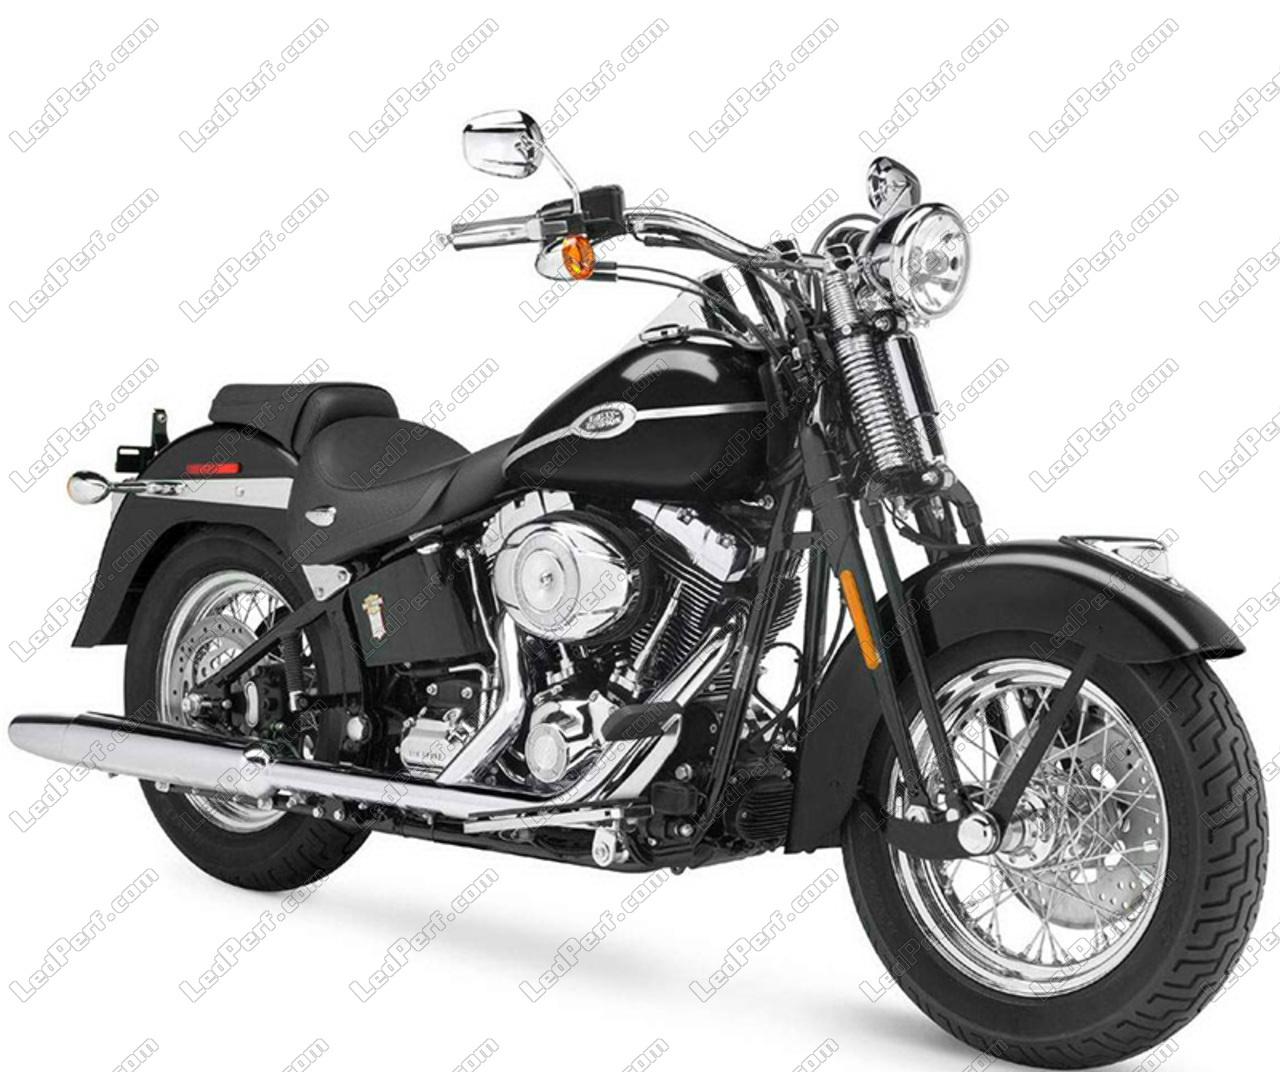 LED Conversion Kit Bulb for Harley-Davidson Springer Classic 1450 - Mini  Size